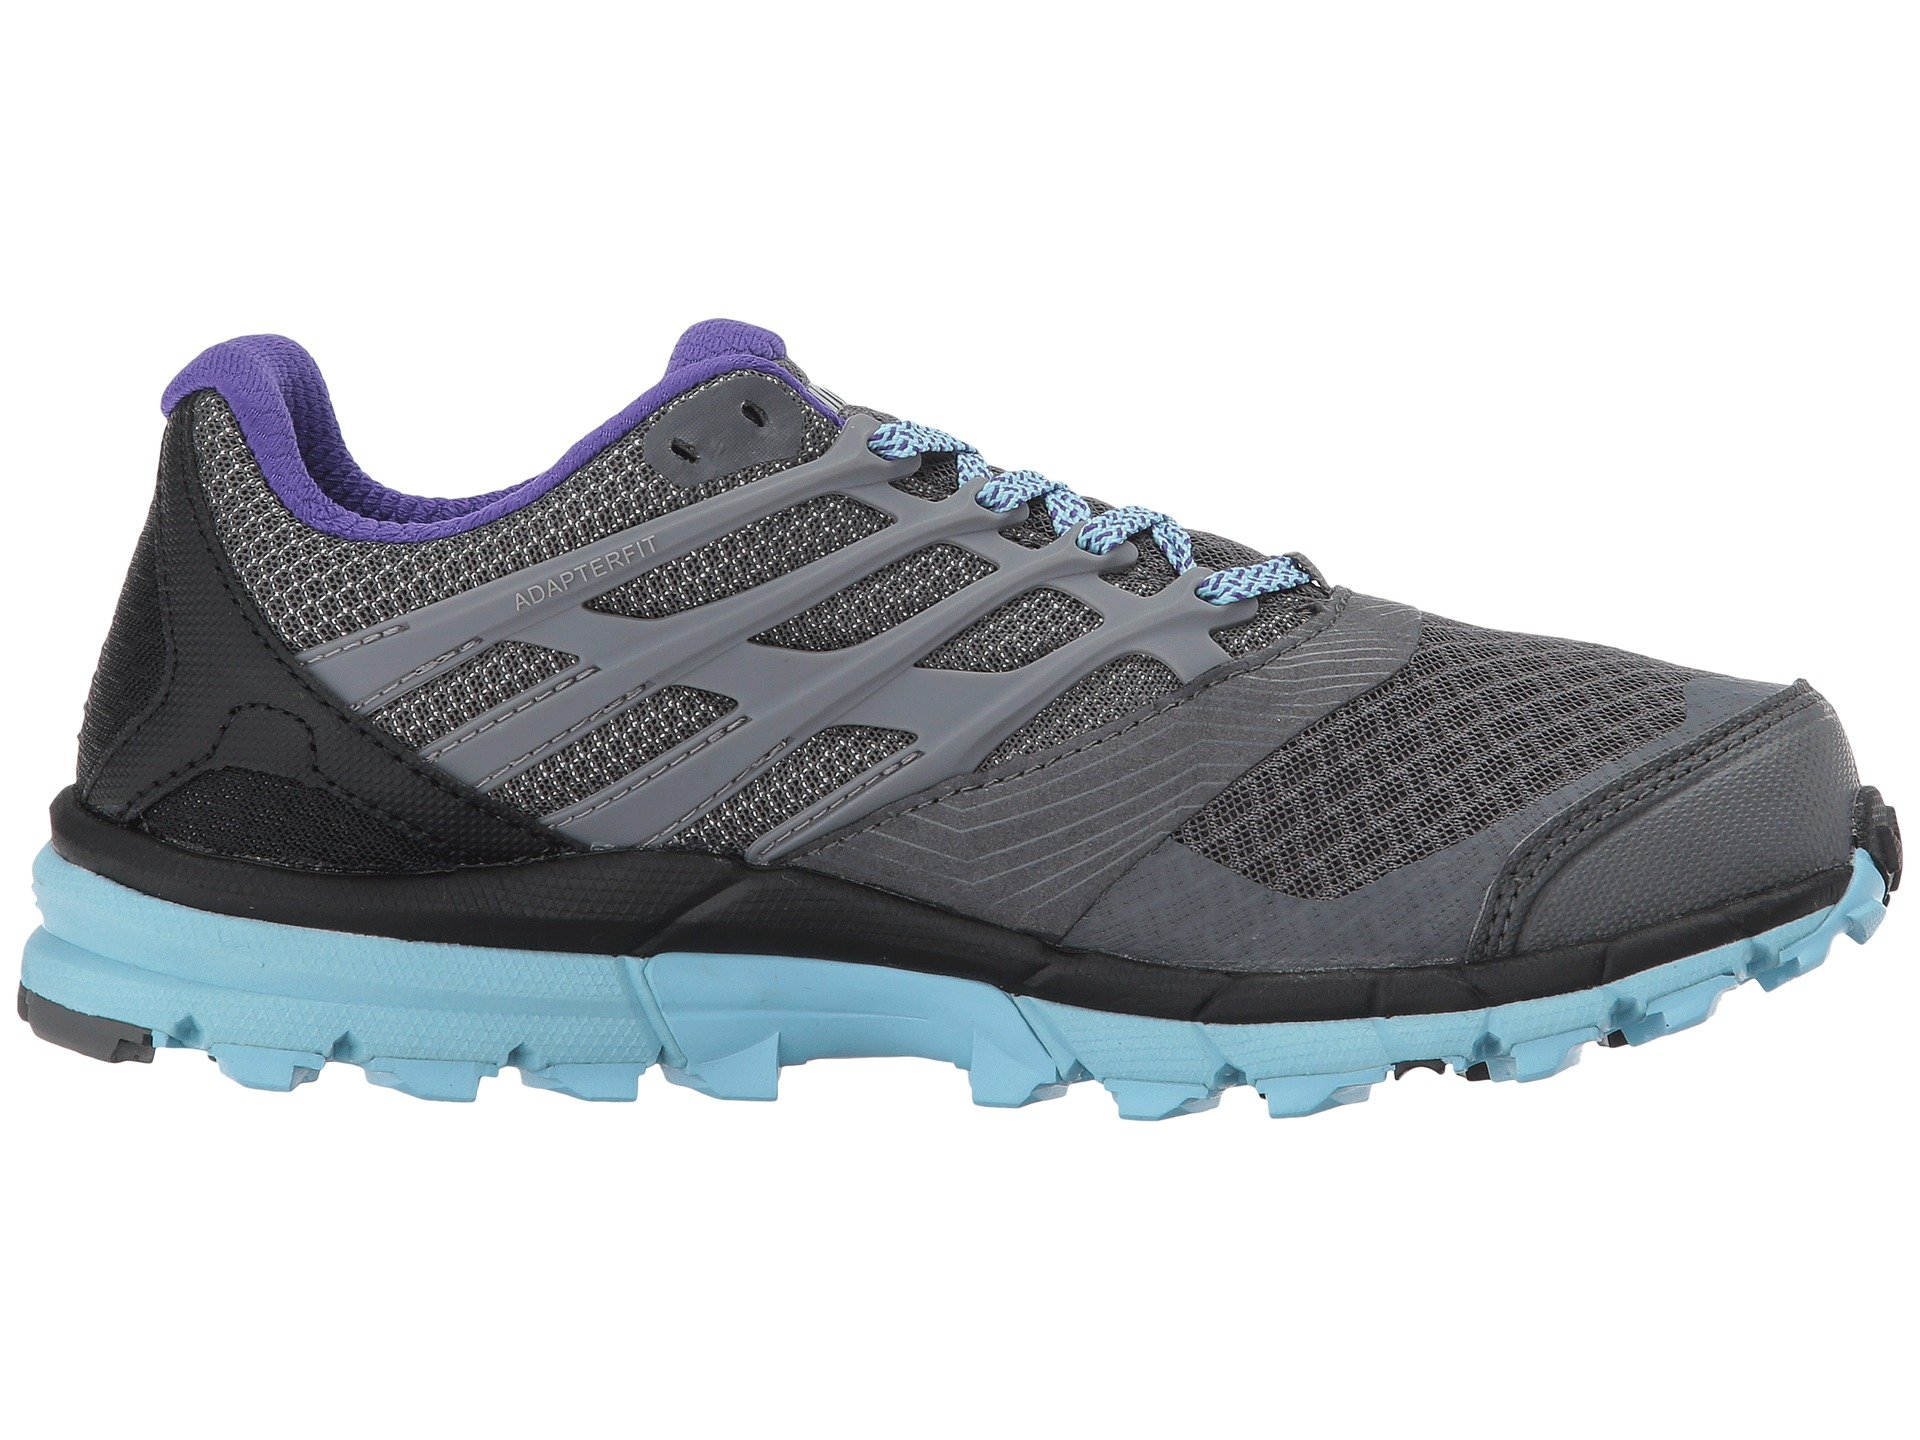 275 8 purple blue Inov Grey Trailtalon g8xzwT